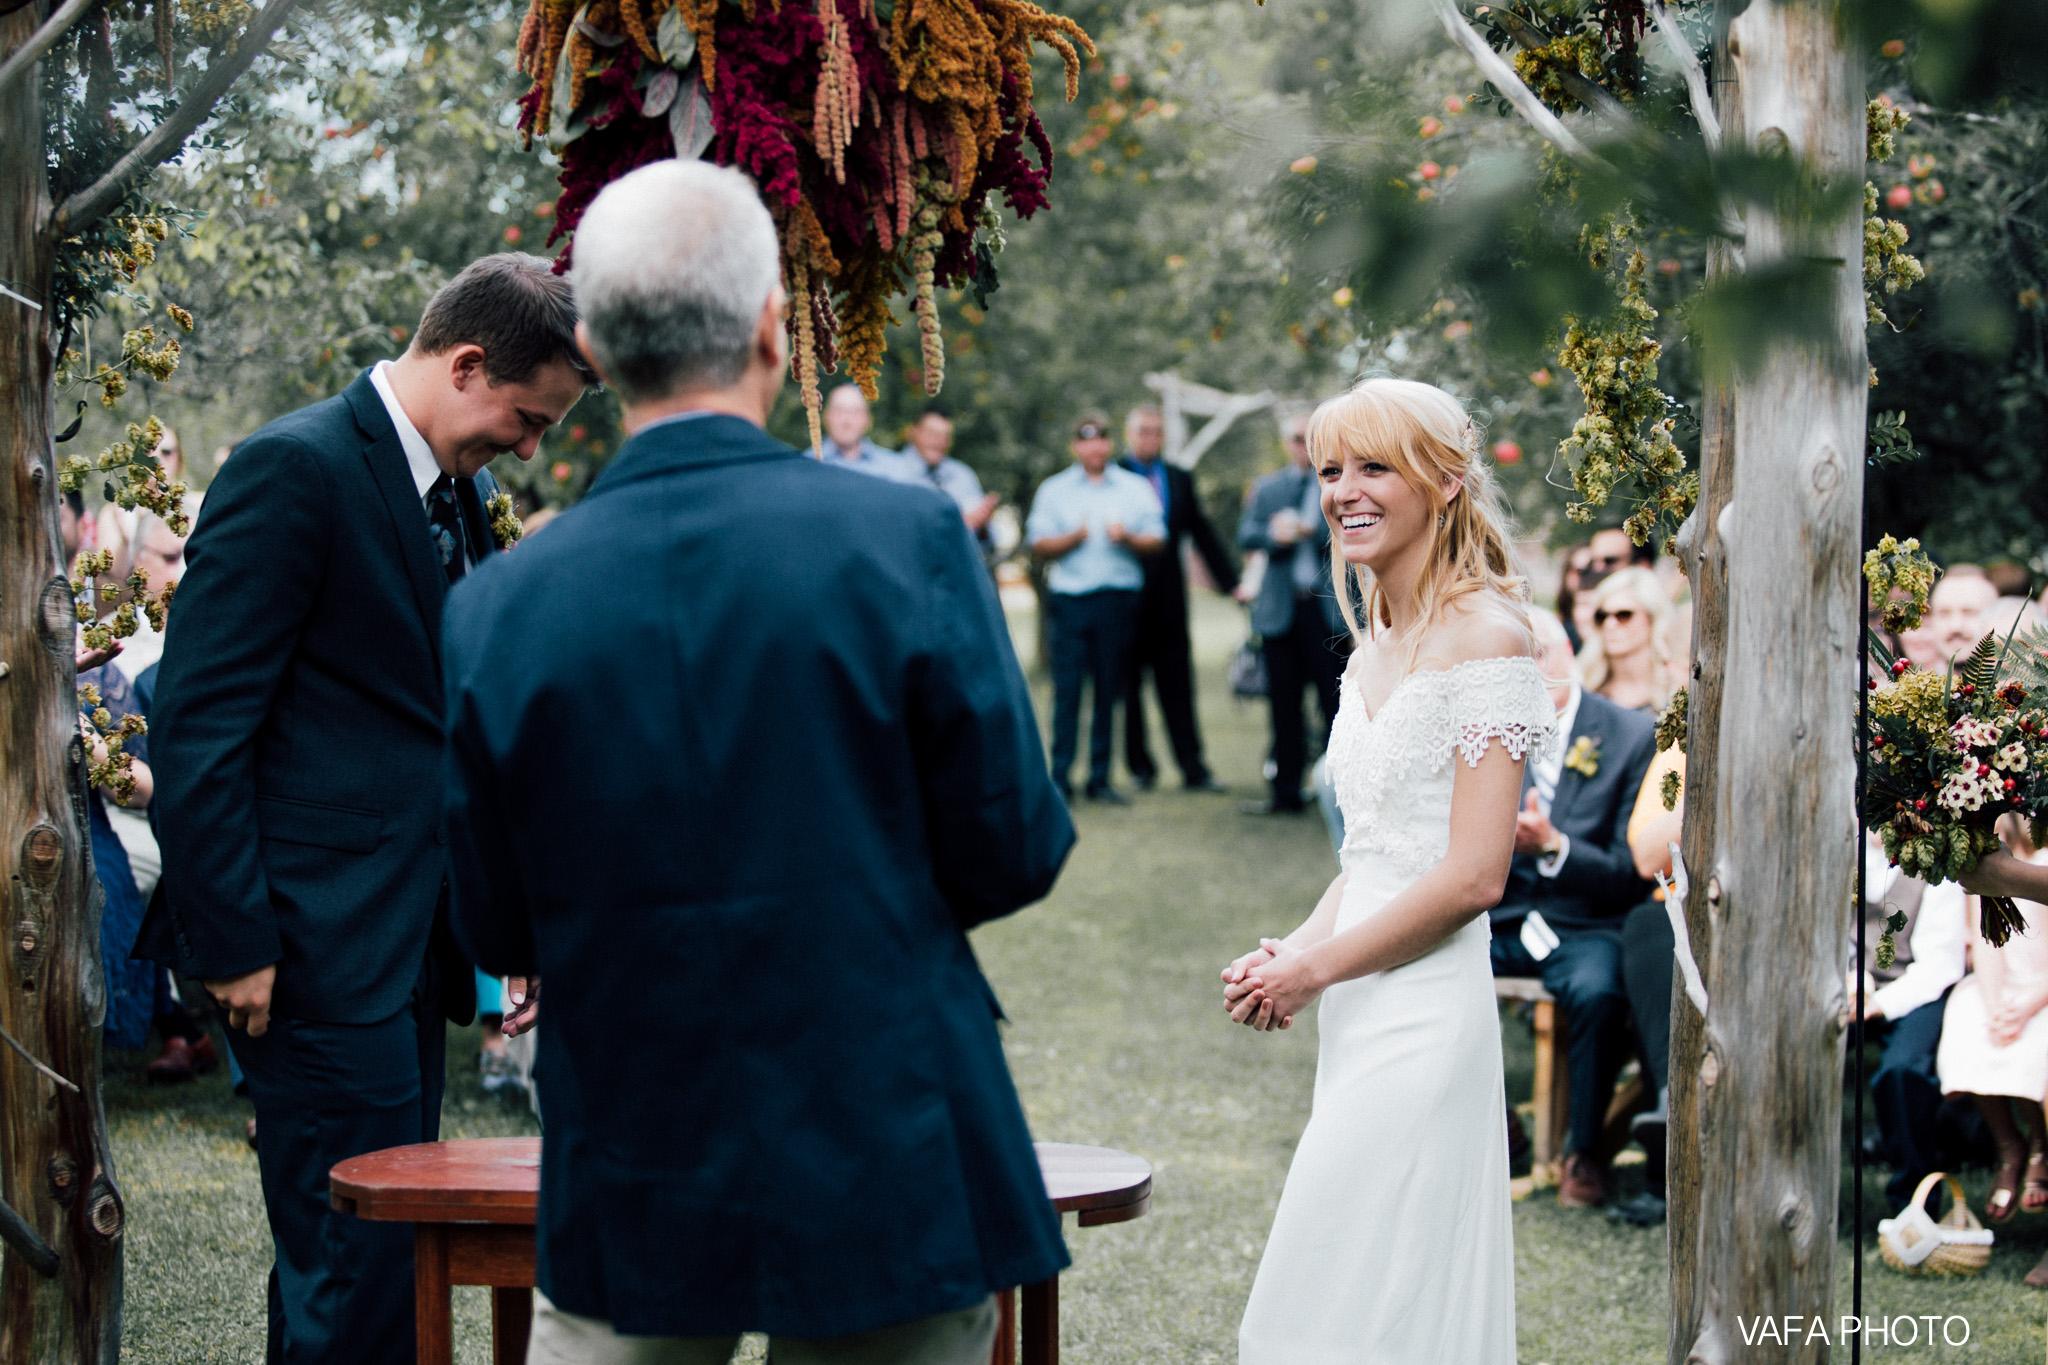 Belsolda-Farm-Wedding-Christy-Eric-Vafa-Photo-471.jpg